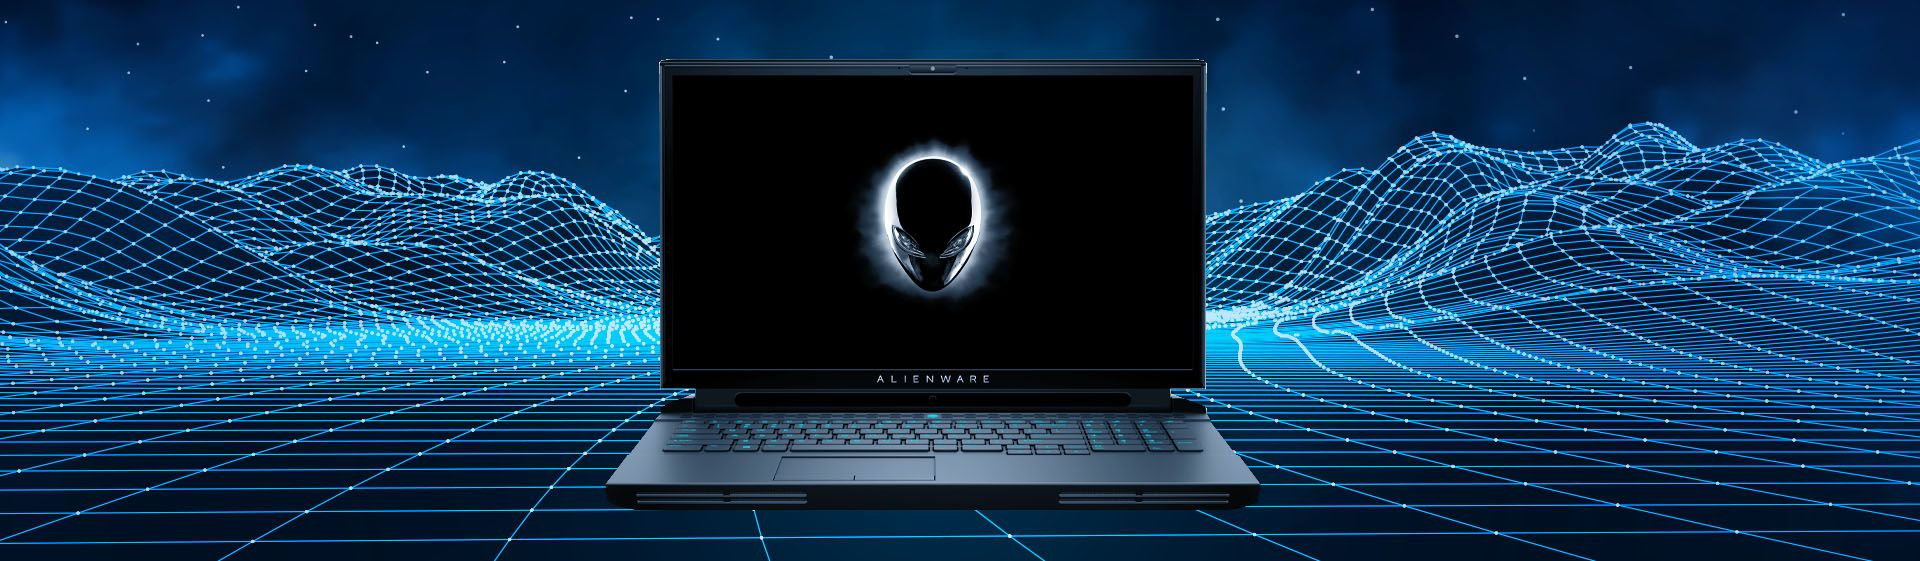 Os 3 Melhores Notebooks Dell Alienware